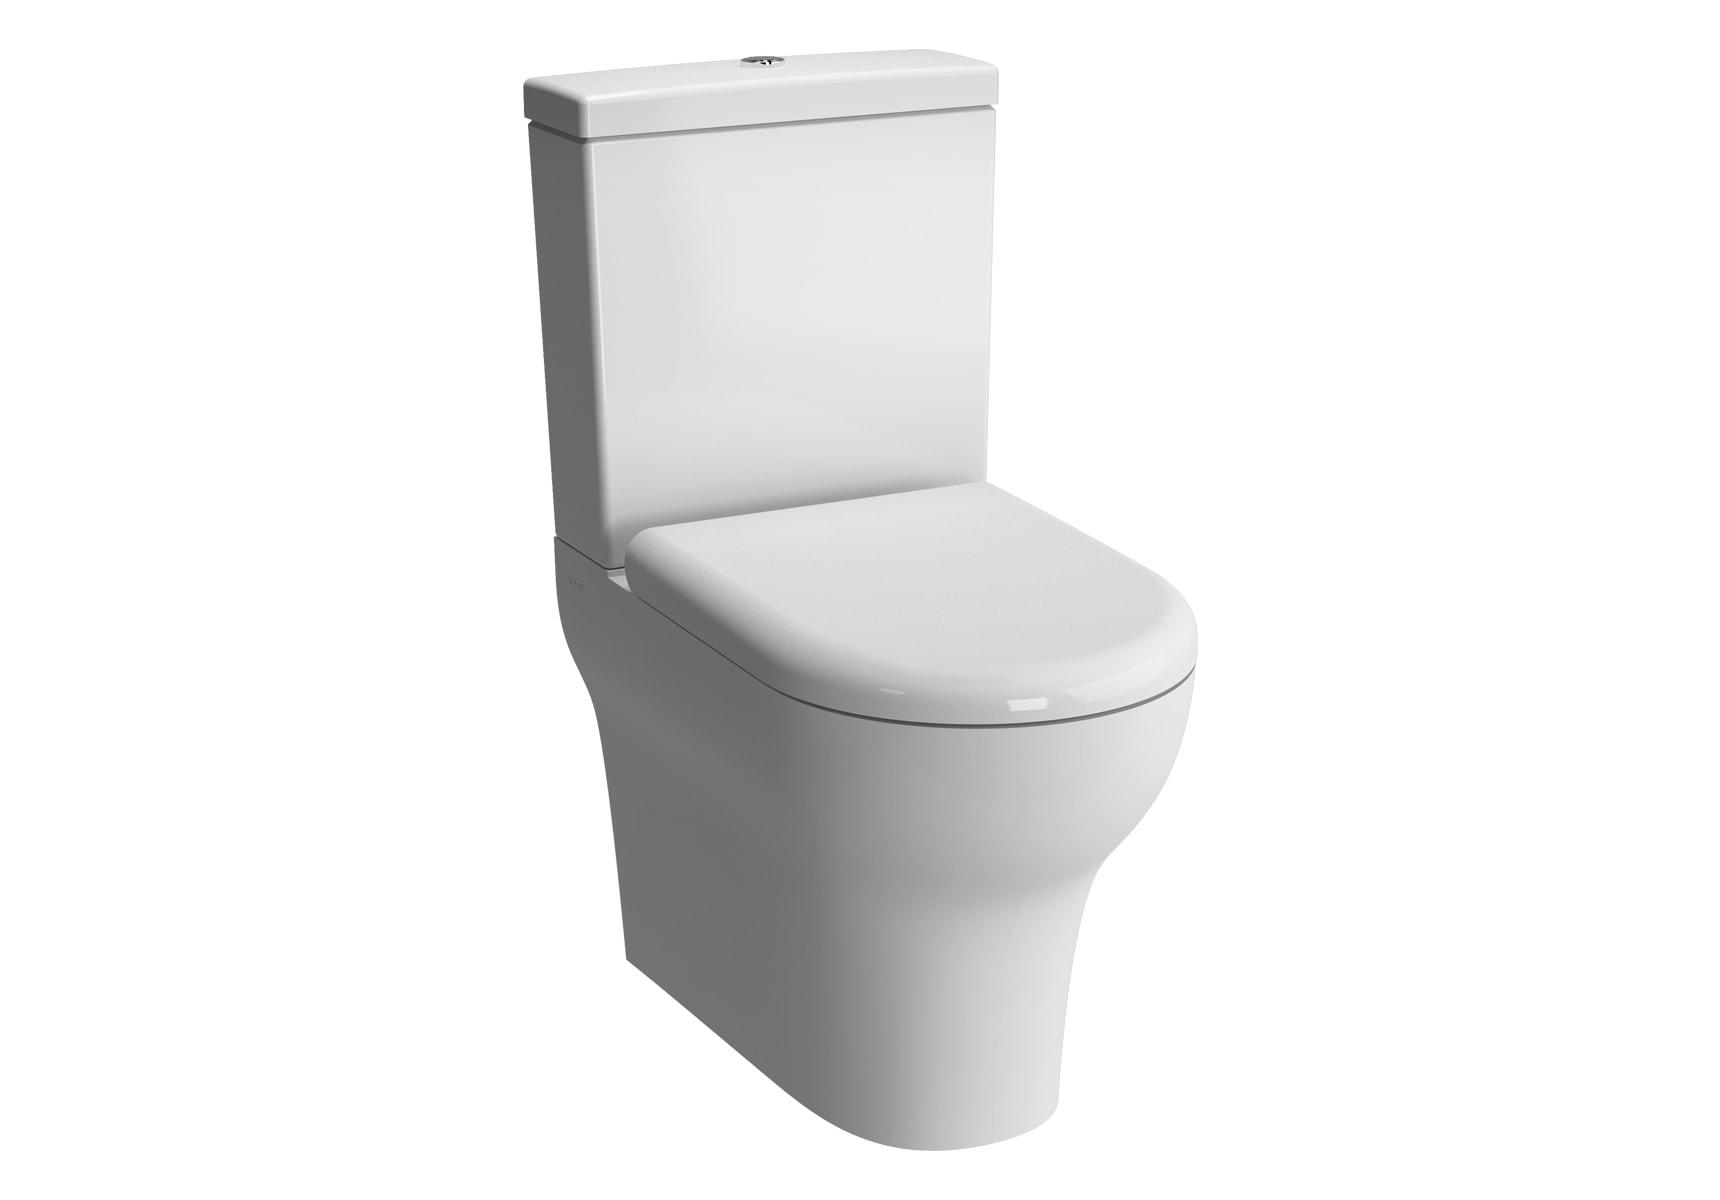 Zentrum Back-To-Wall WC Pan, 60cm